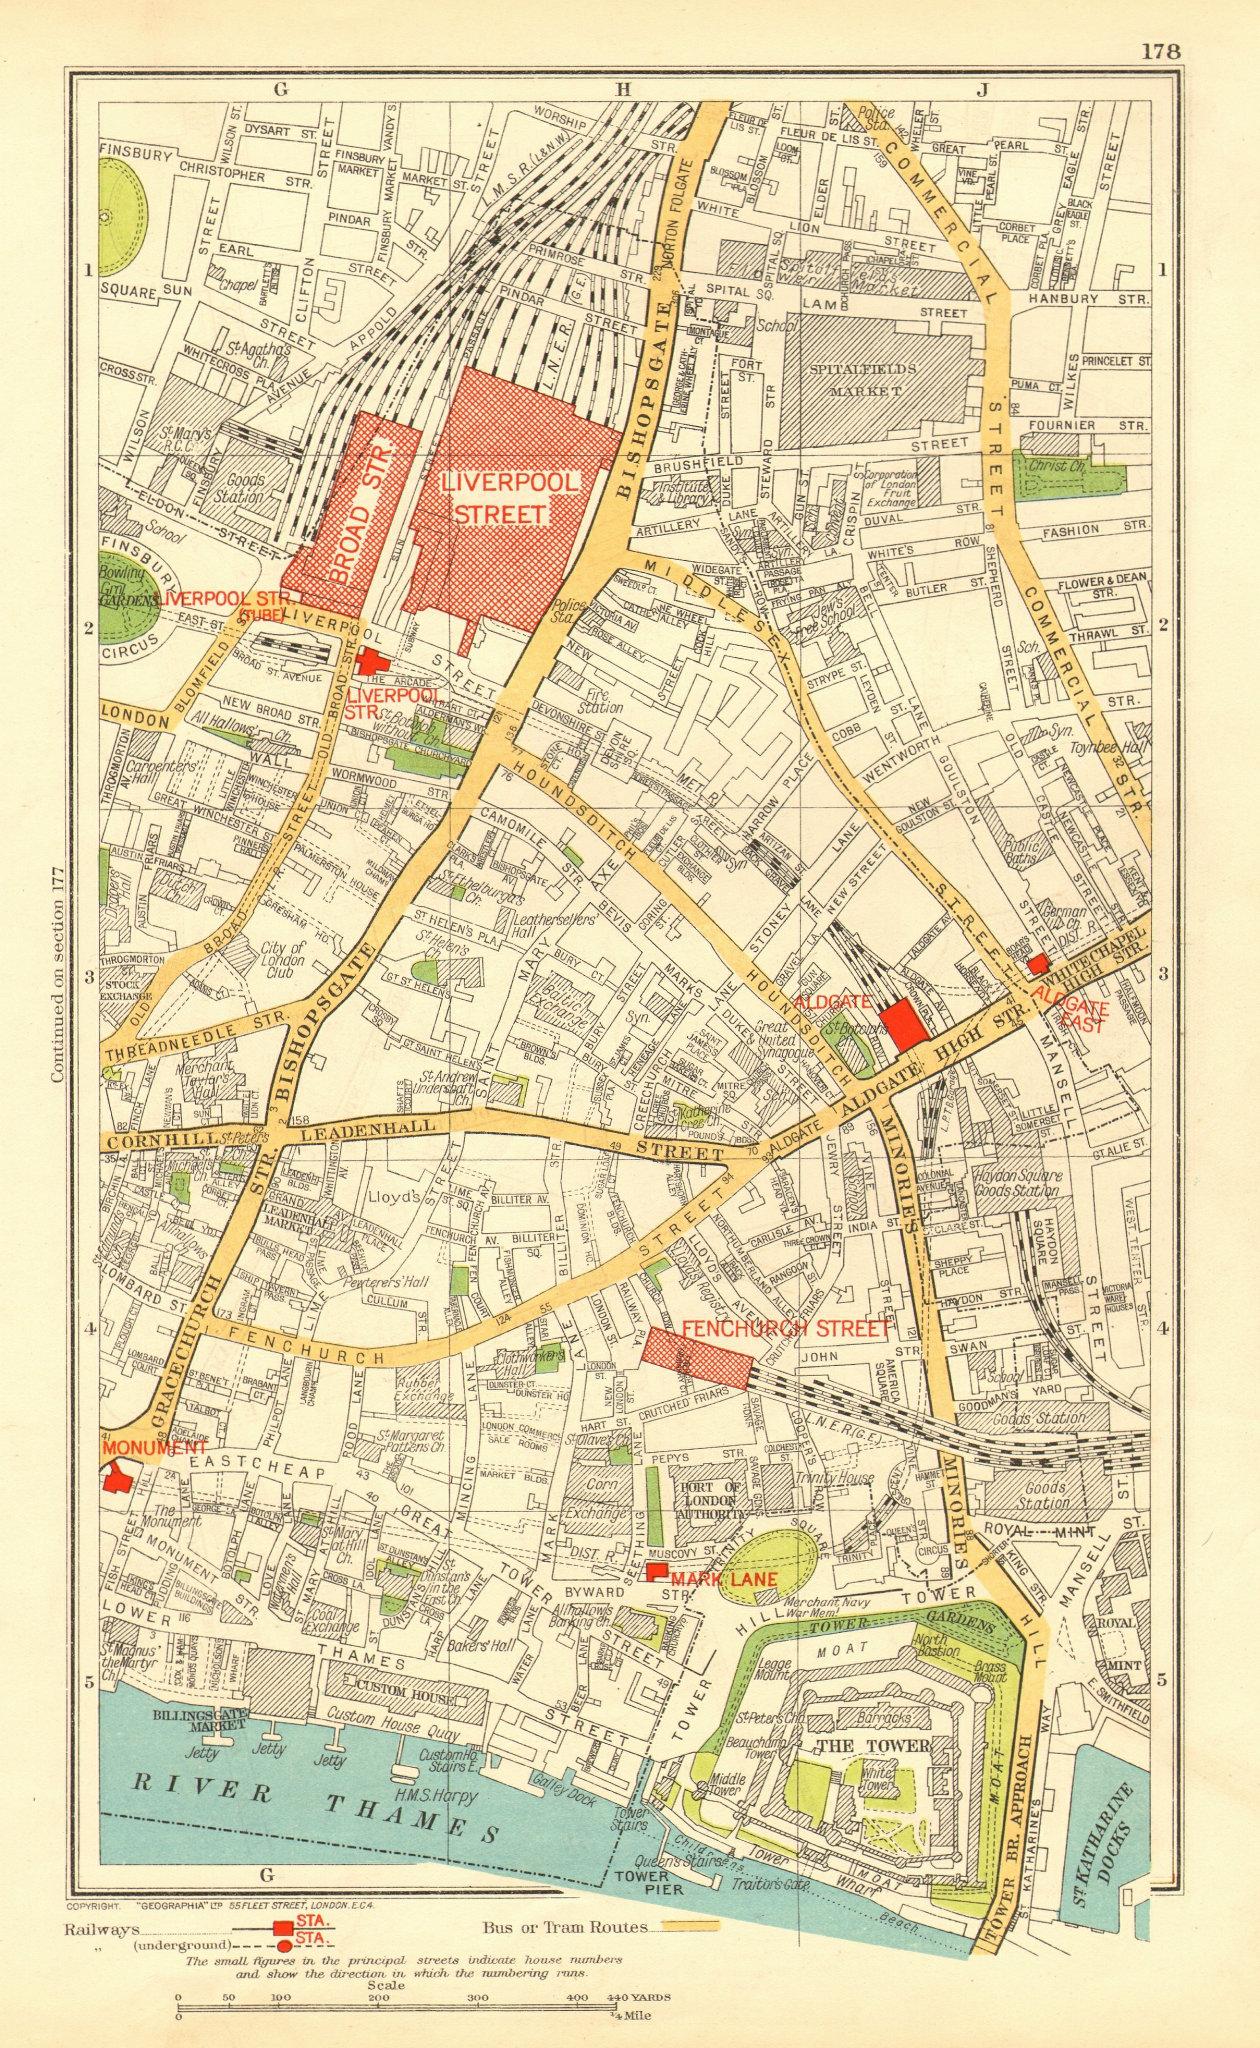 Associate Product LONDON. City. Tower Liverpool Street Bishopsgate 1937 old vintage map chart